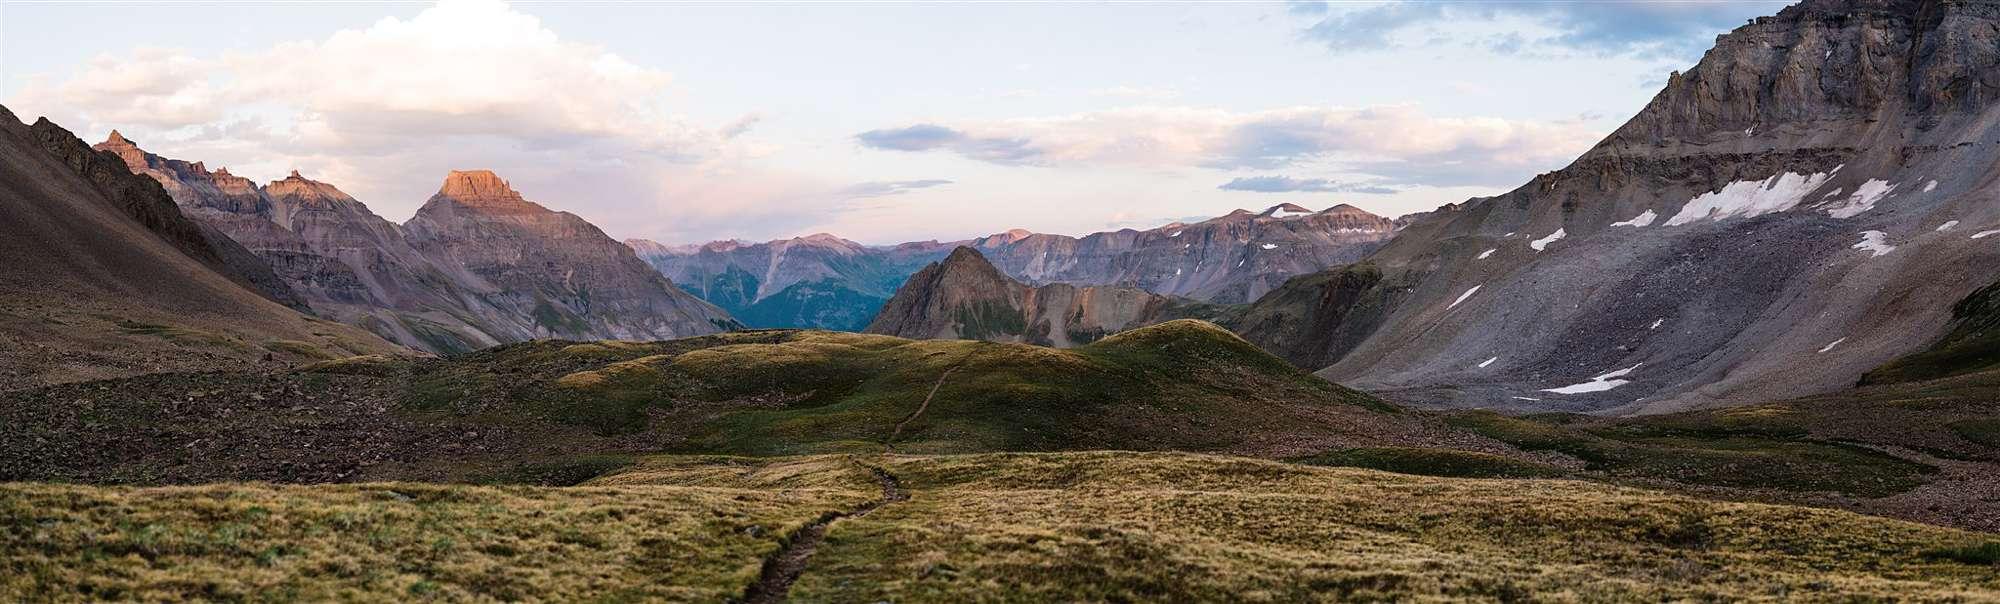 Colorado_Jeeping_Elopement_Emily_Matt_The_Foxes_Photography_0044.jpg